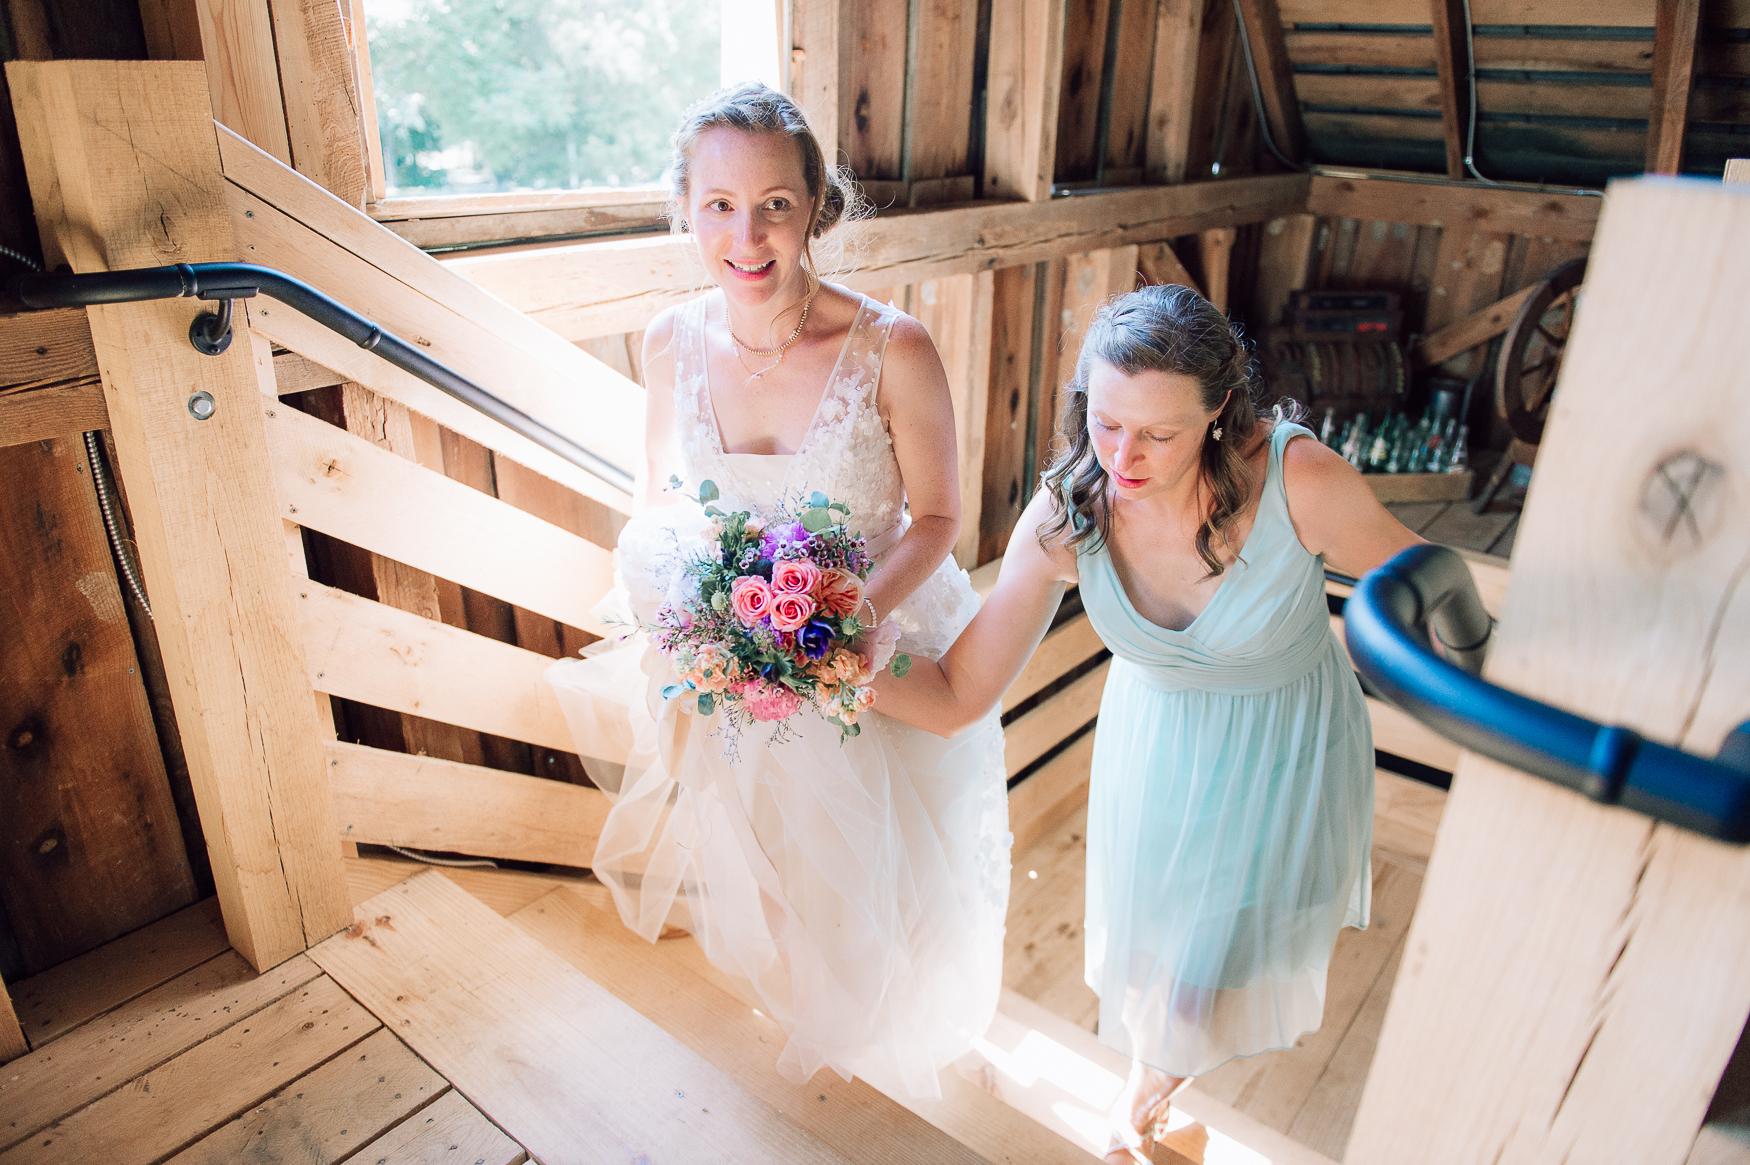 virginiawedding_theGlasgowFarm_rusticwedding_fredericksburg_youseephotography_CarolineDale (103).jpg